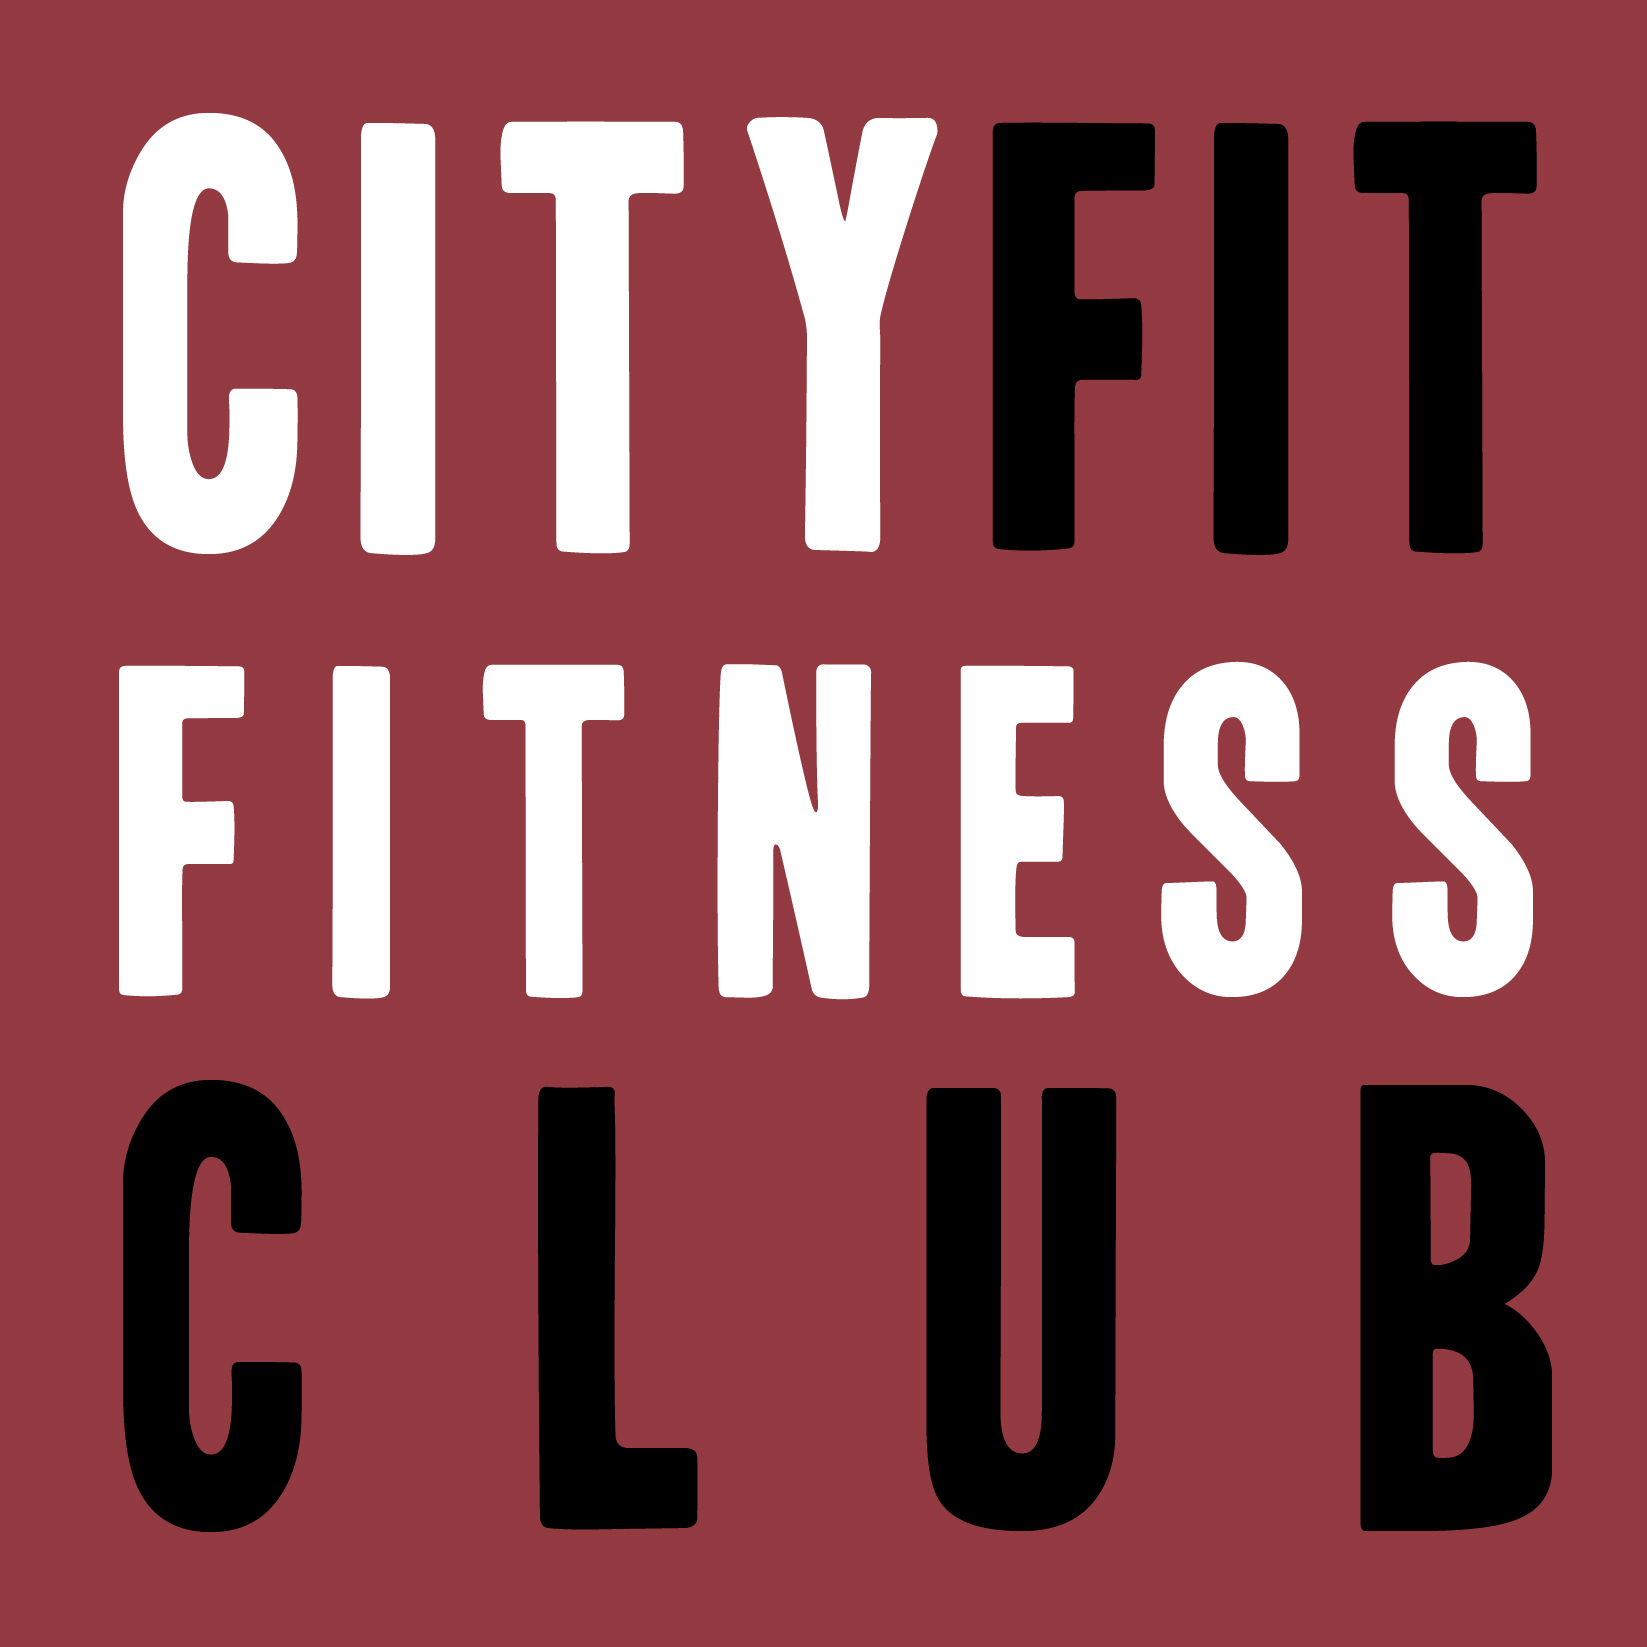 44 - Cityfit